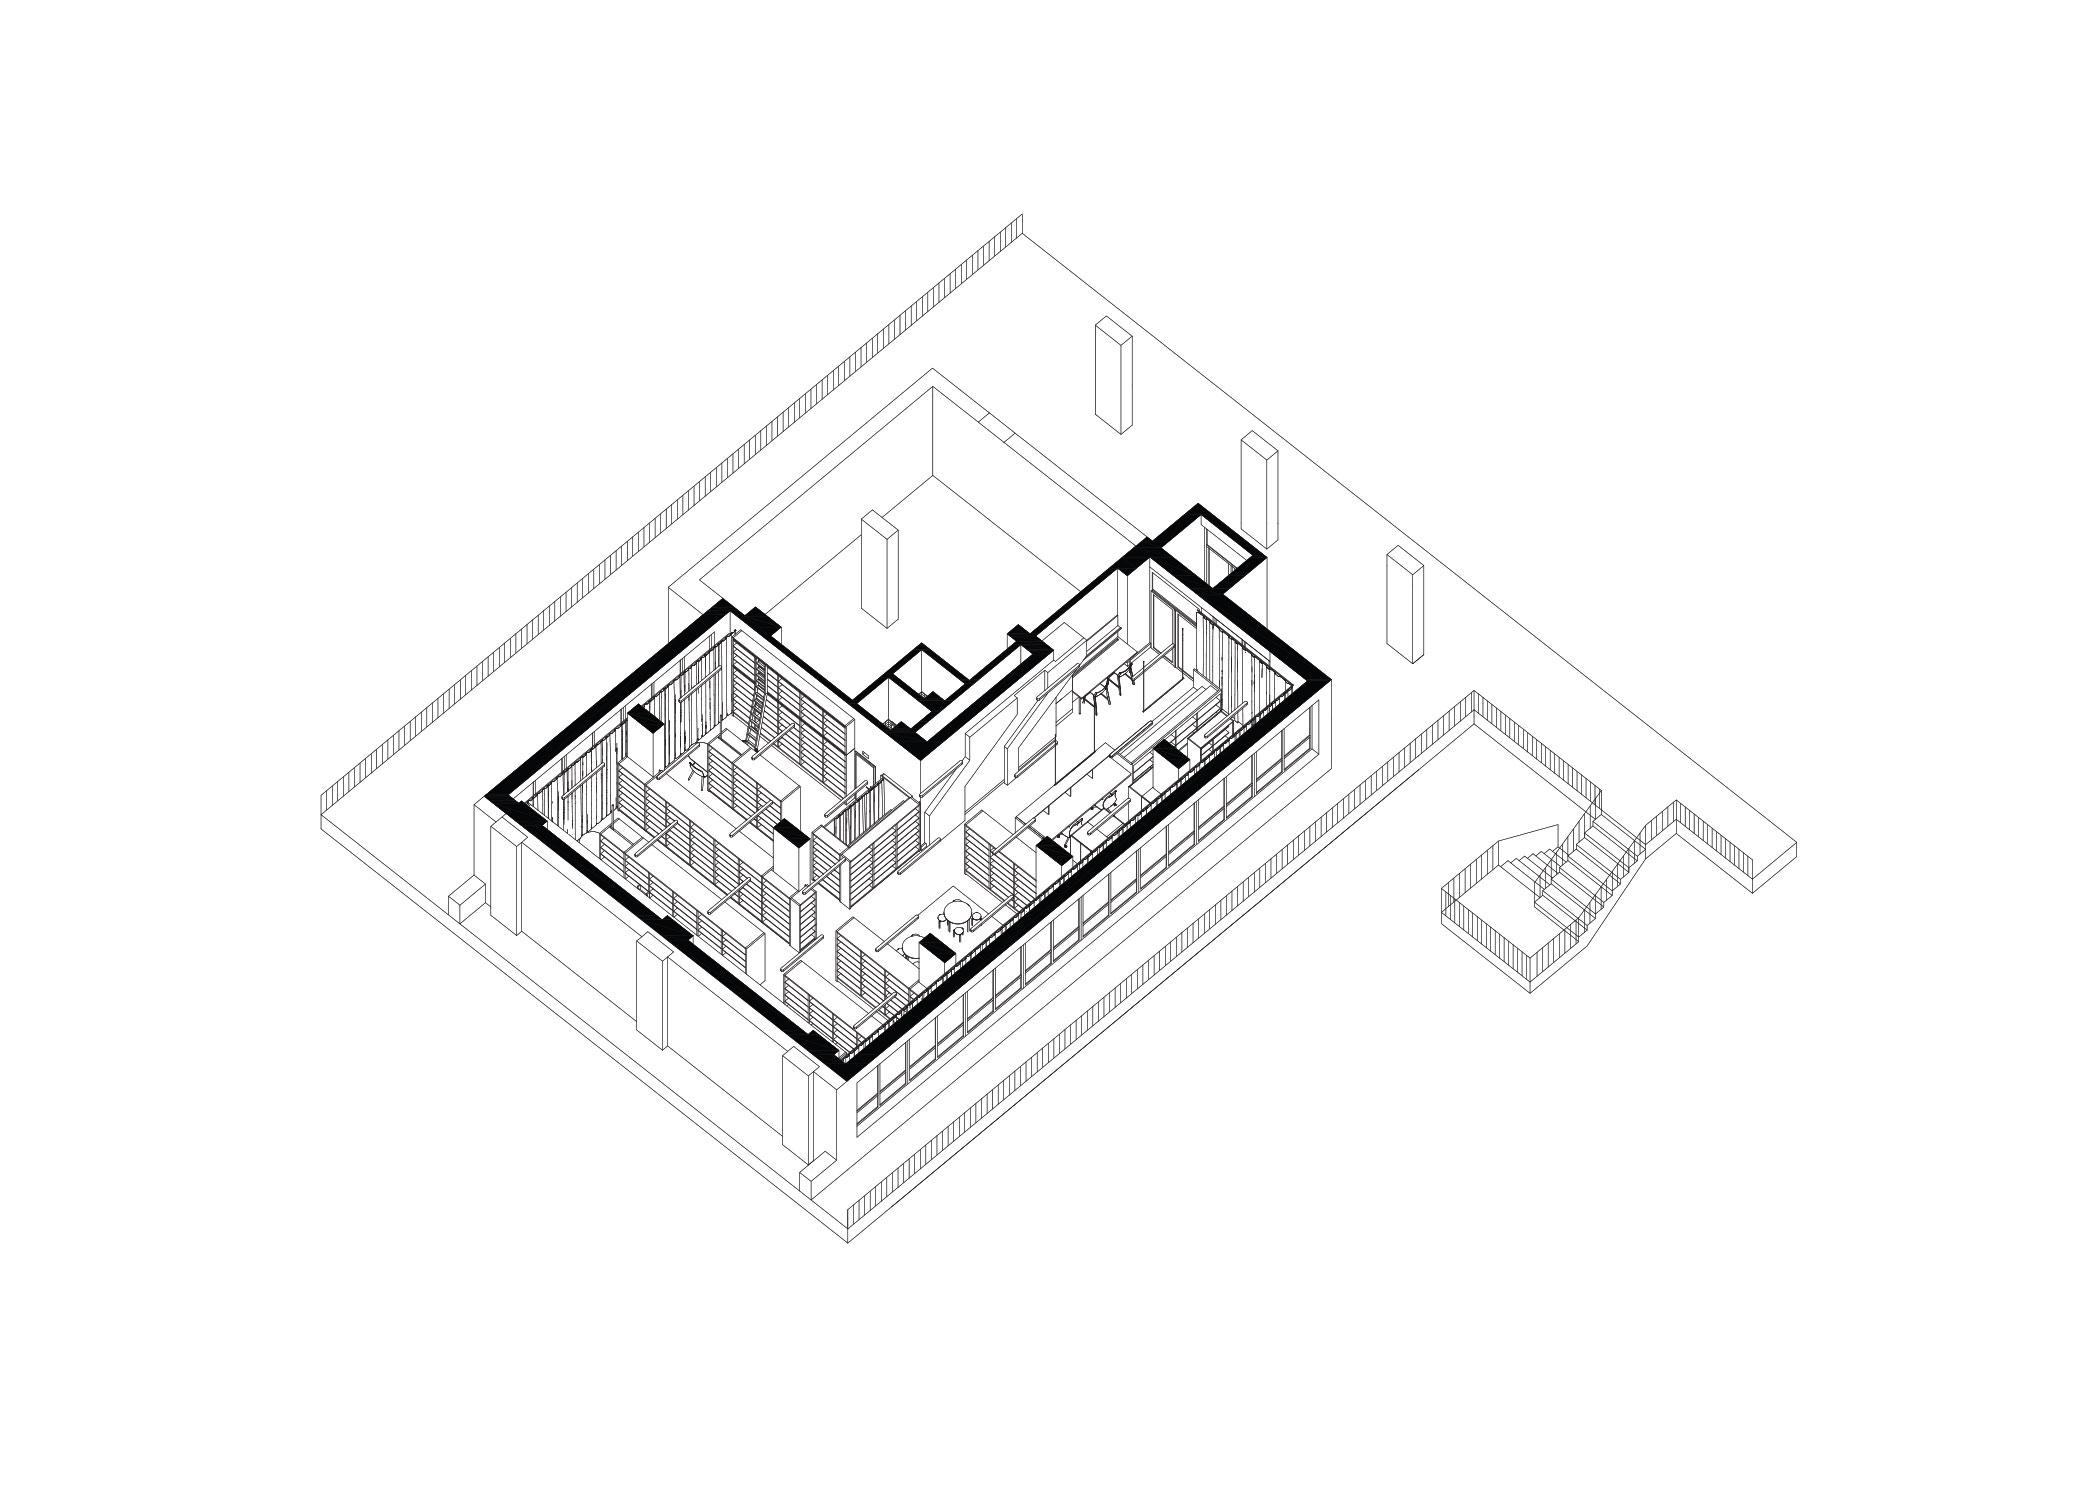 noiz-architekti-bratislava-kniznica-petrzalka-vavilovova-06